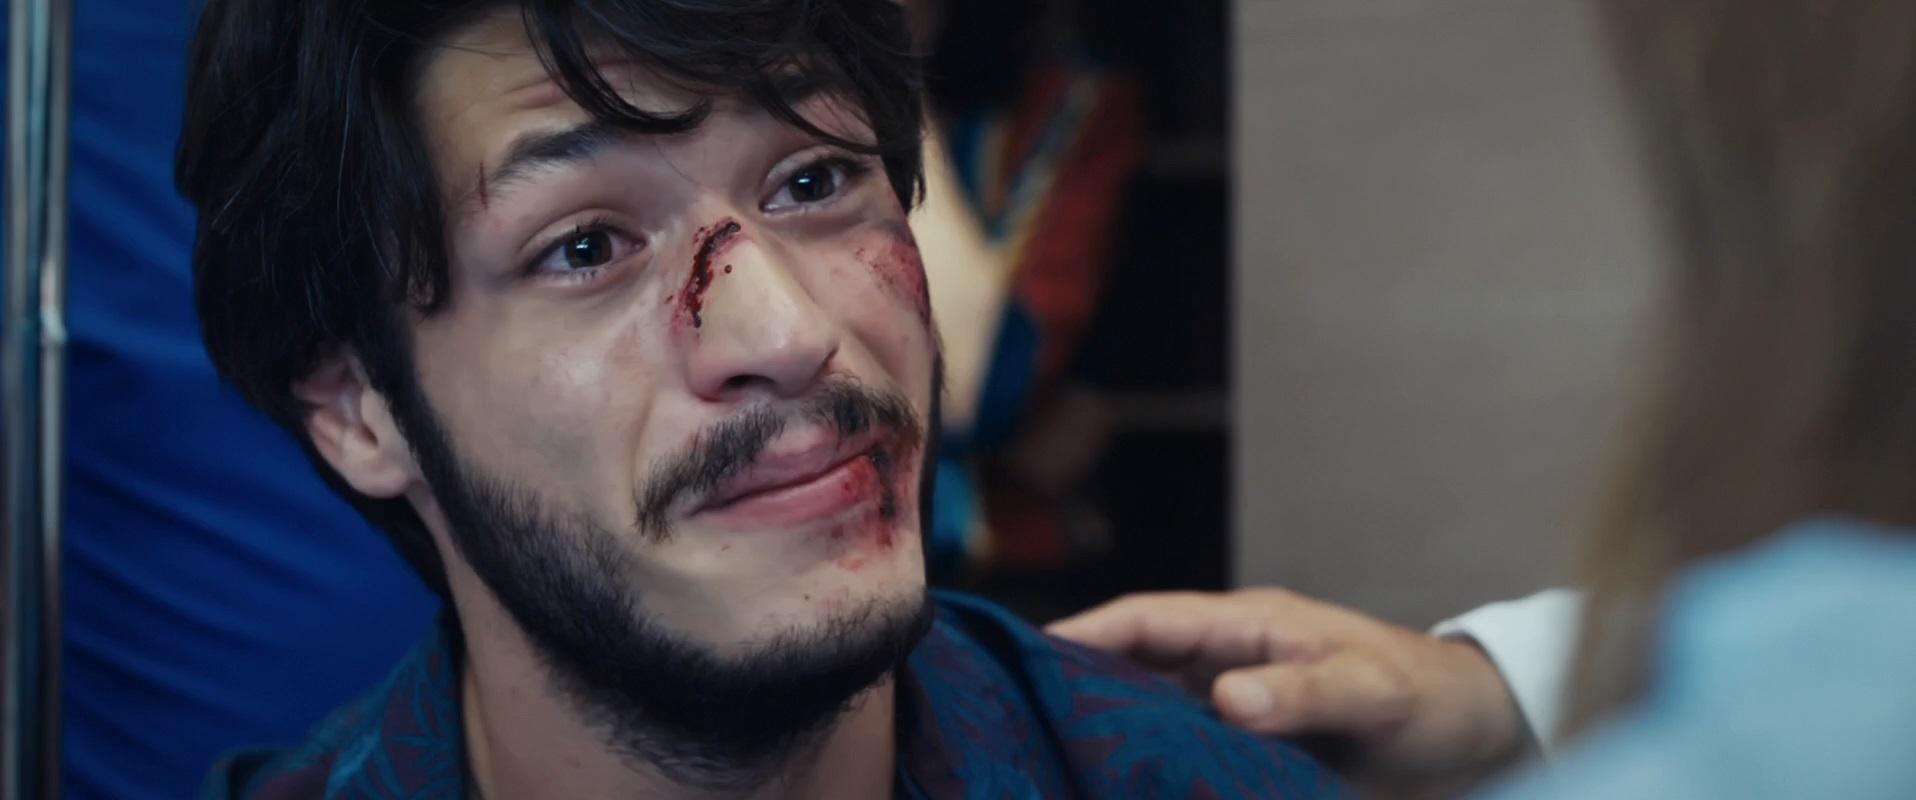 Aşk Bu Mu? | 2018 | Yerli Film | WEB-DL | XviD | Sansürsüz | 1080p - m720p - m1080p | WEB-DL | Tek Link